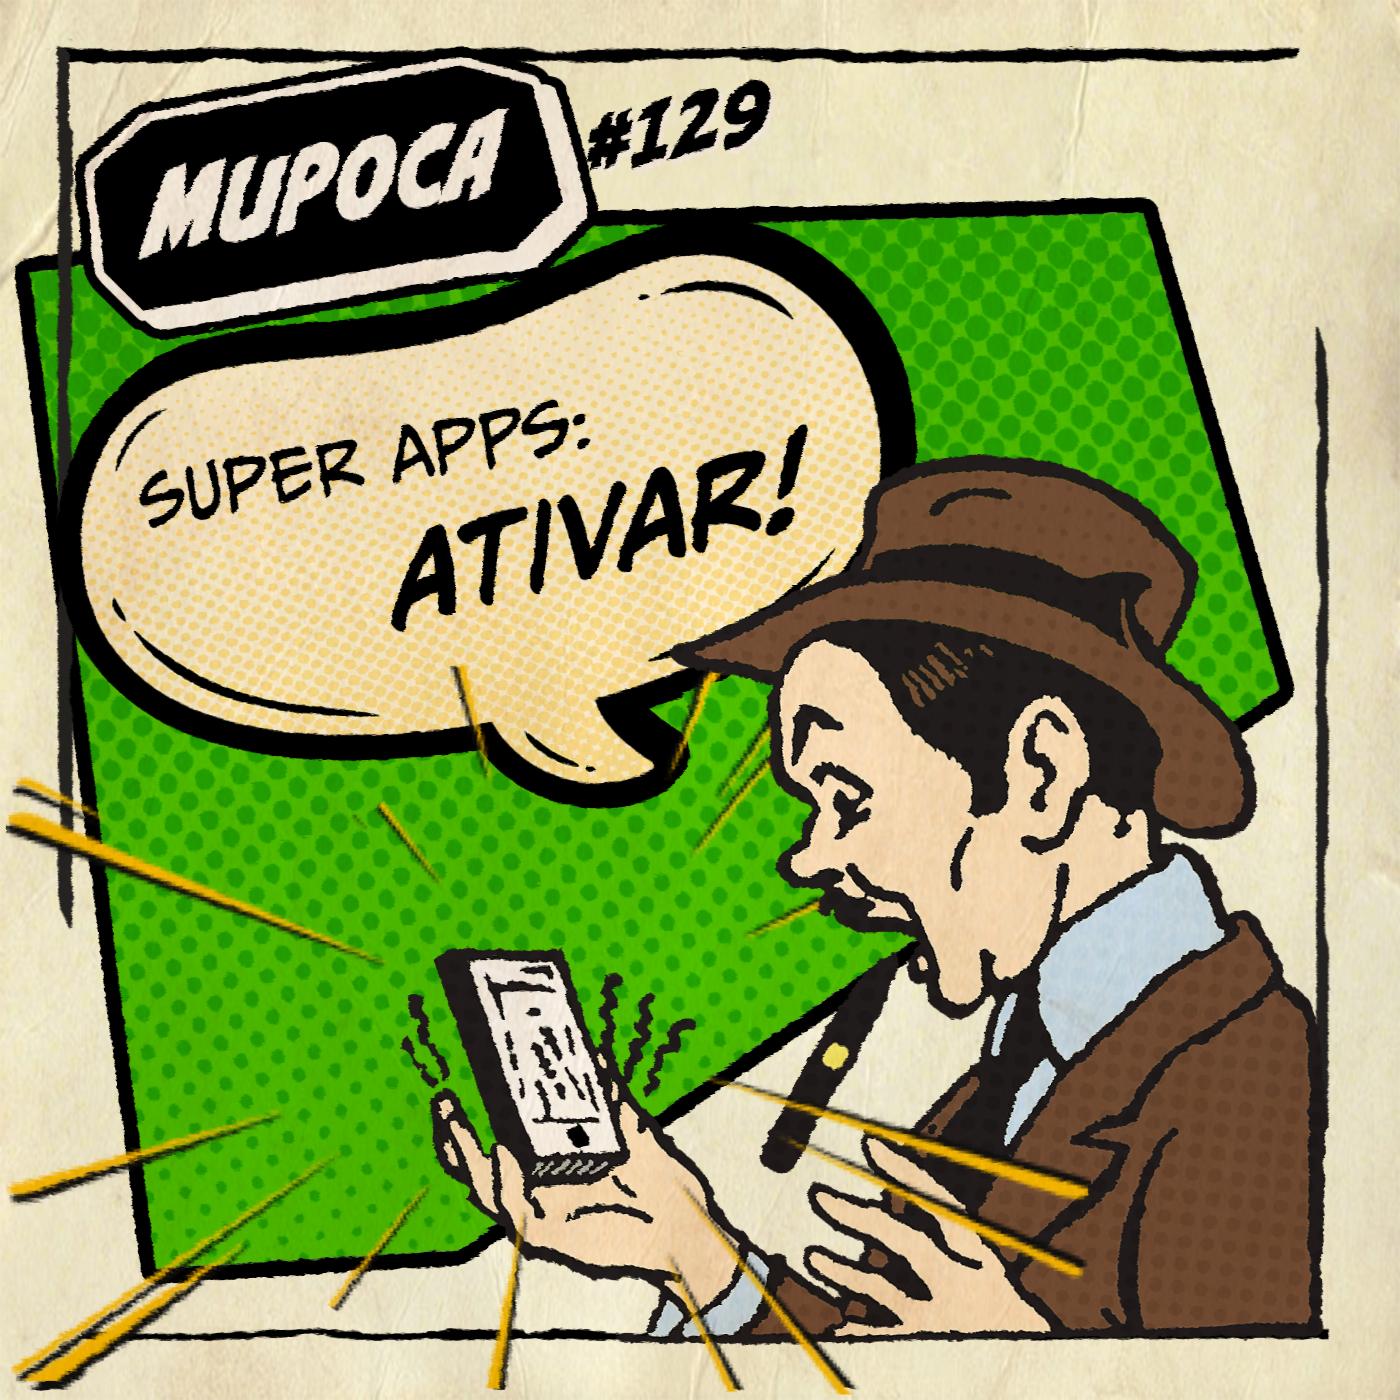 Capa - Super Apps, ativar!